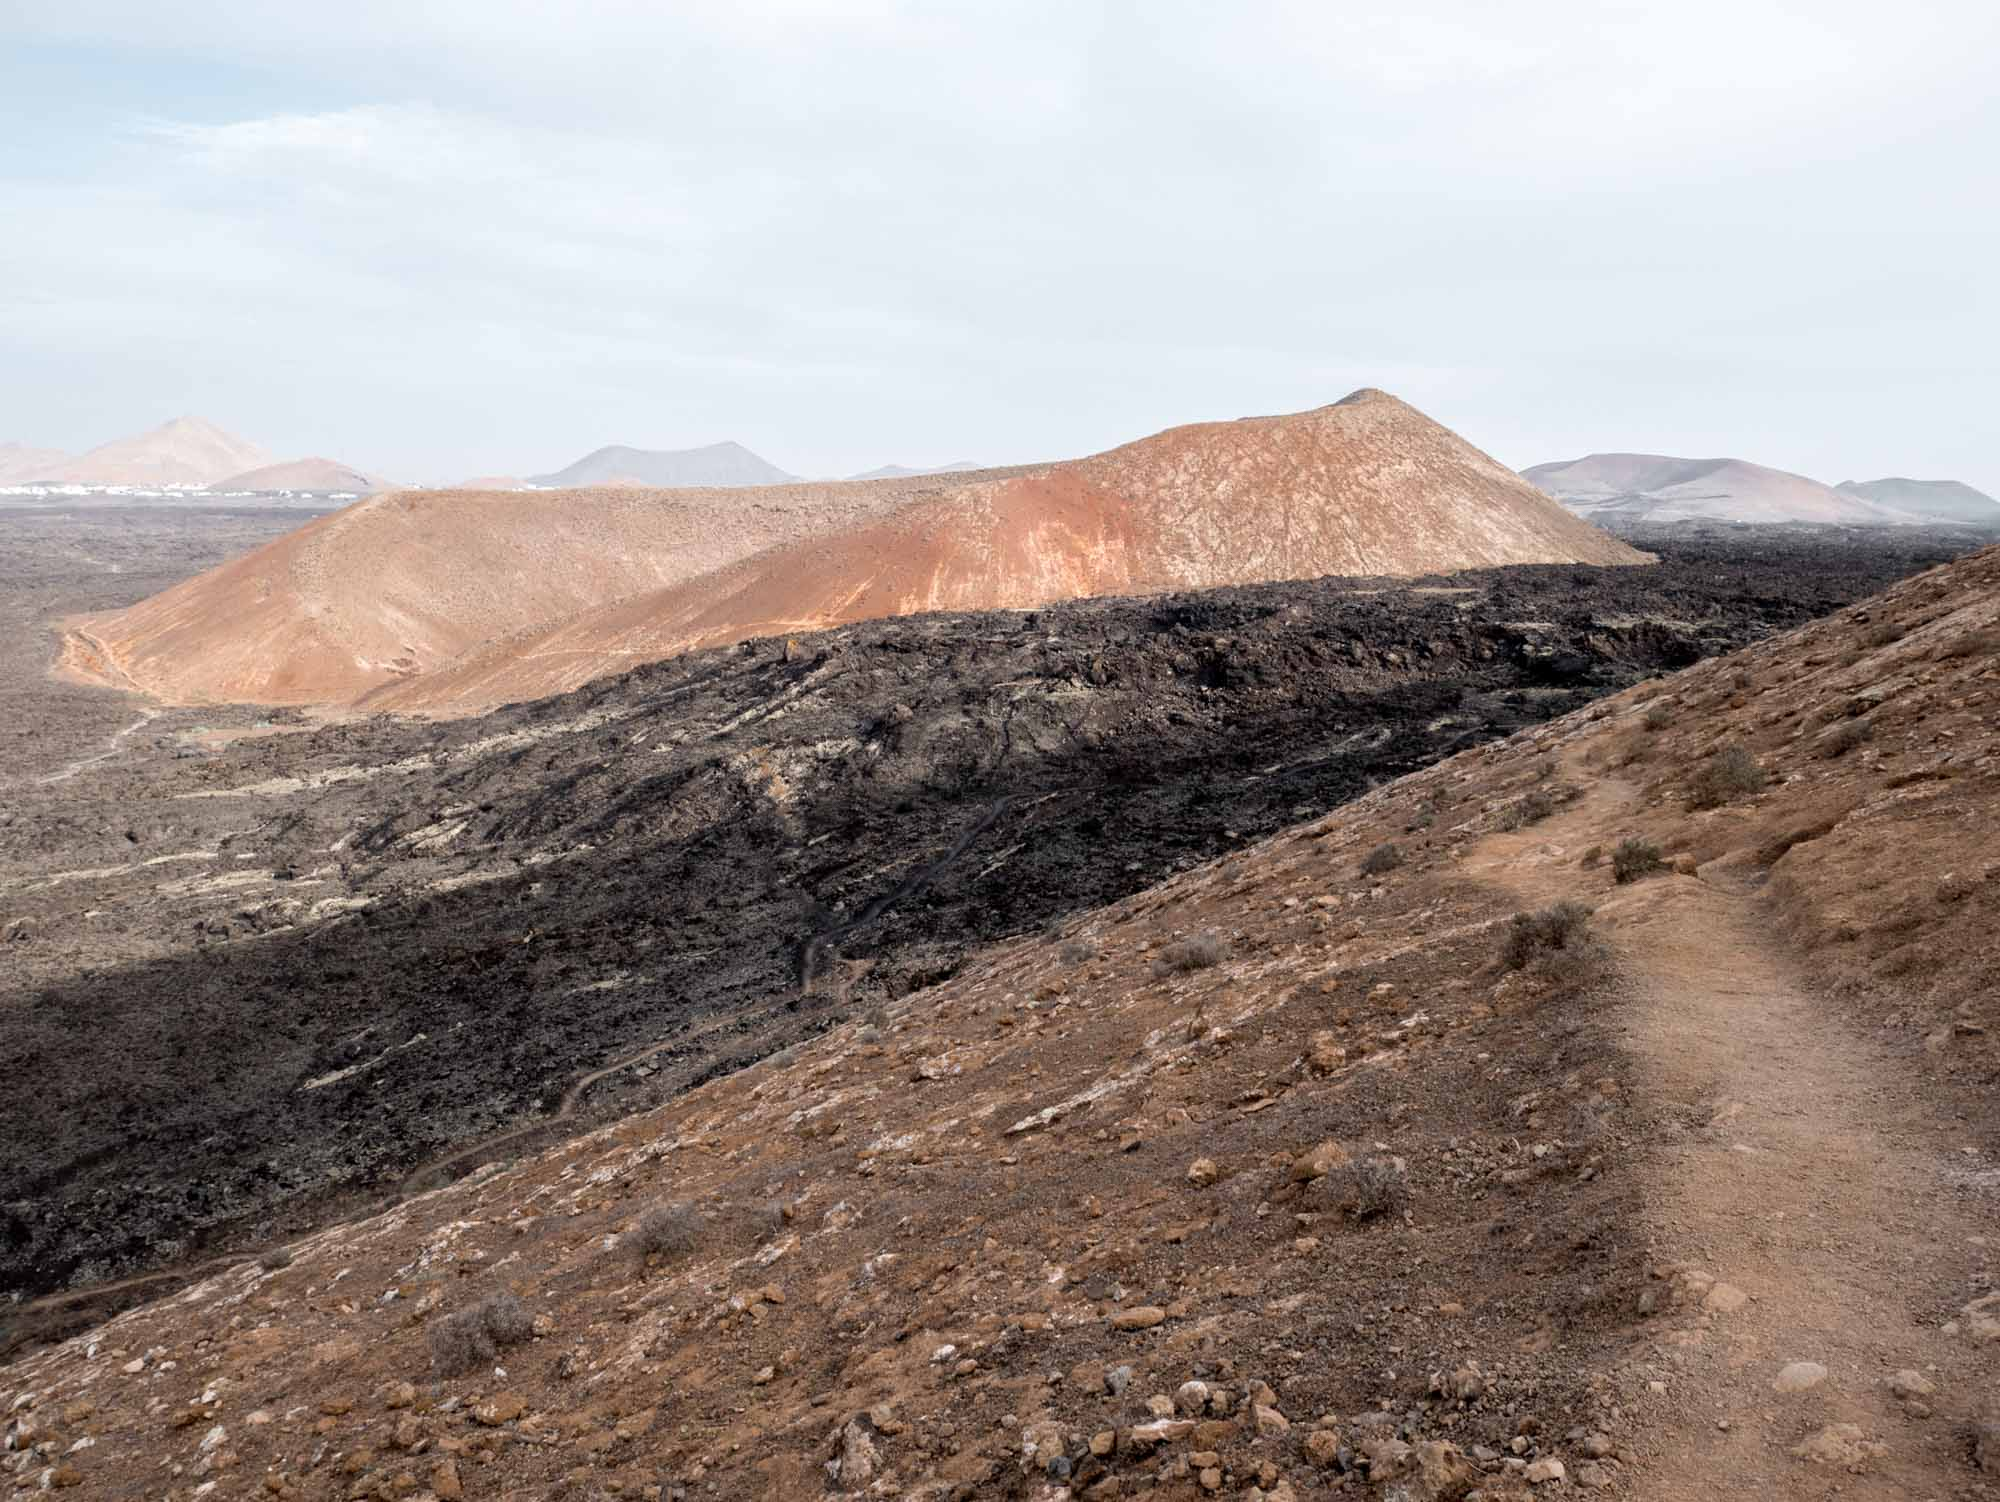 Paysage de Lanzarote au mois de novembre